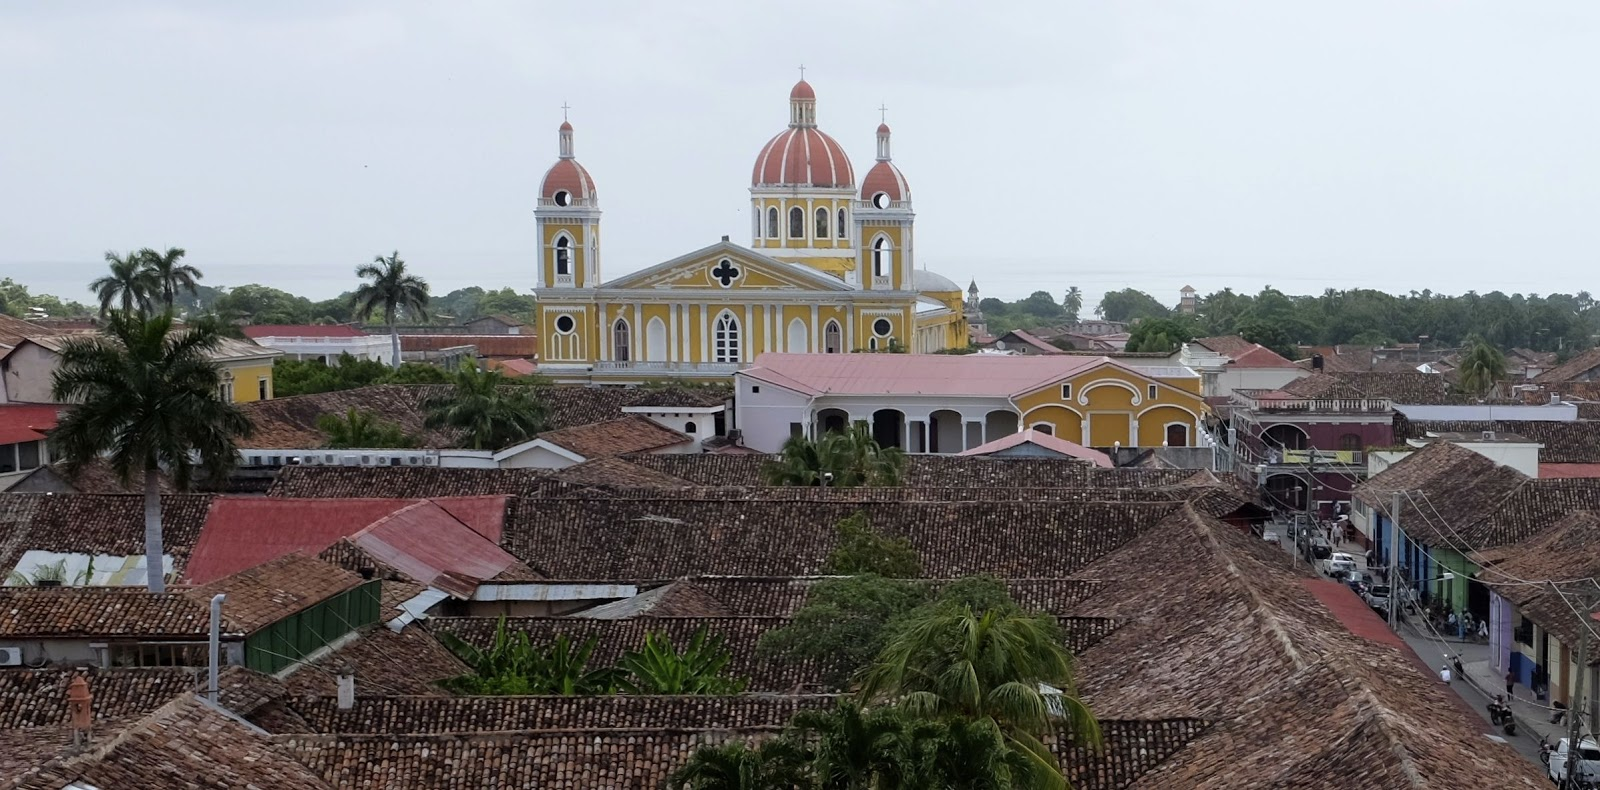 Granada's roofs